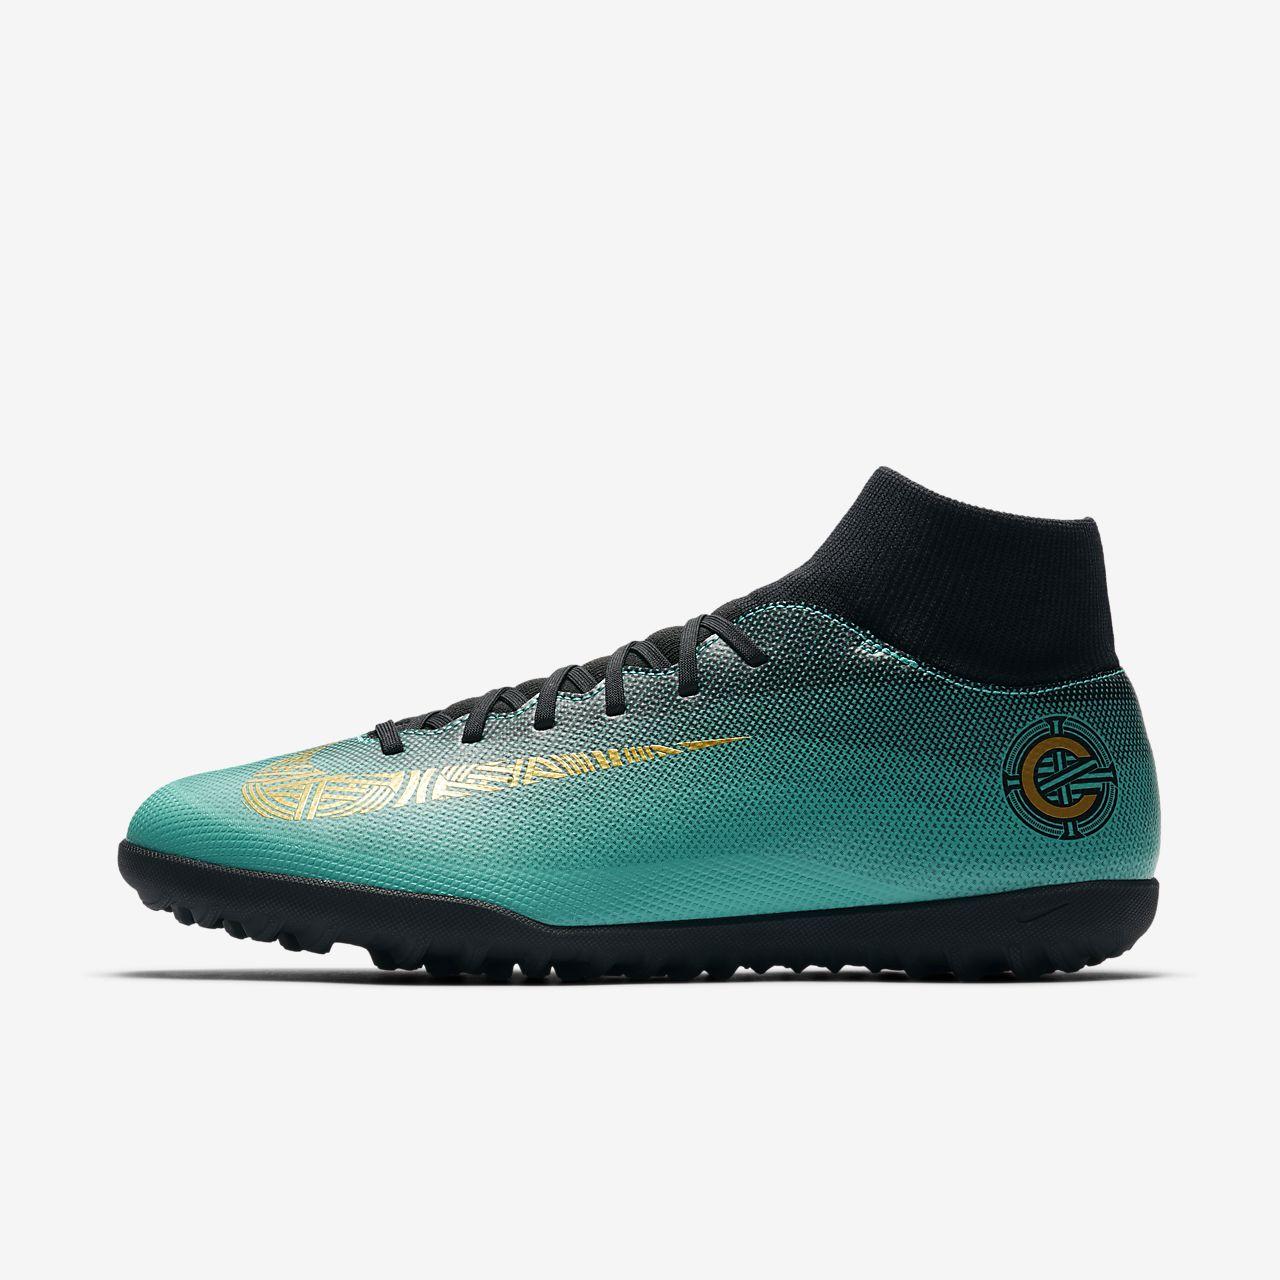 ... proximo ii cr7 ic 852538 376 mens indoor soccer shoes sz 10 b84da  8055e  italy nike mercurialx superfly vi club cr7 turf football shoe 2b687  b5587 a066ca743d